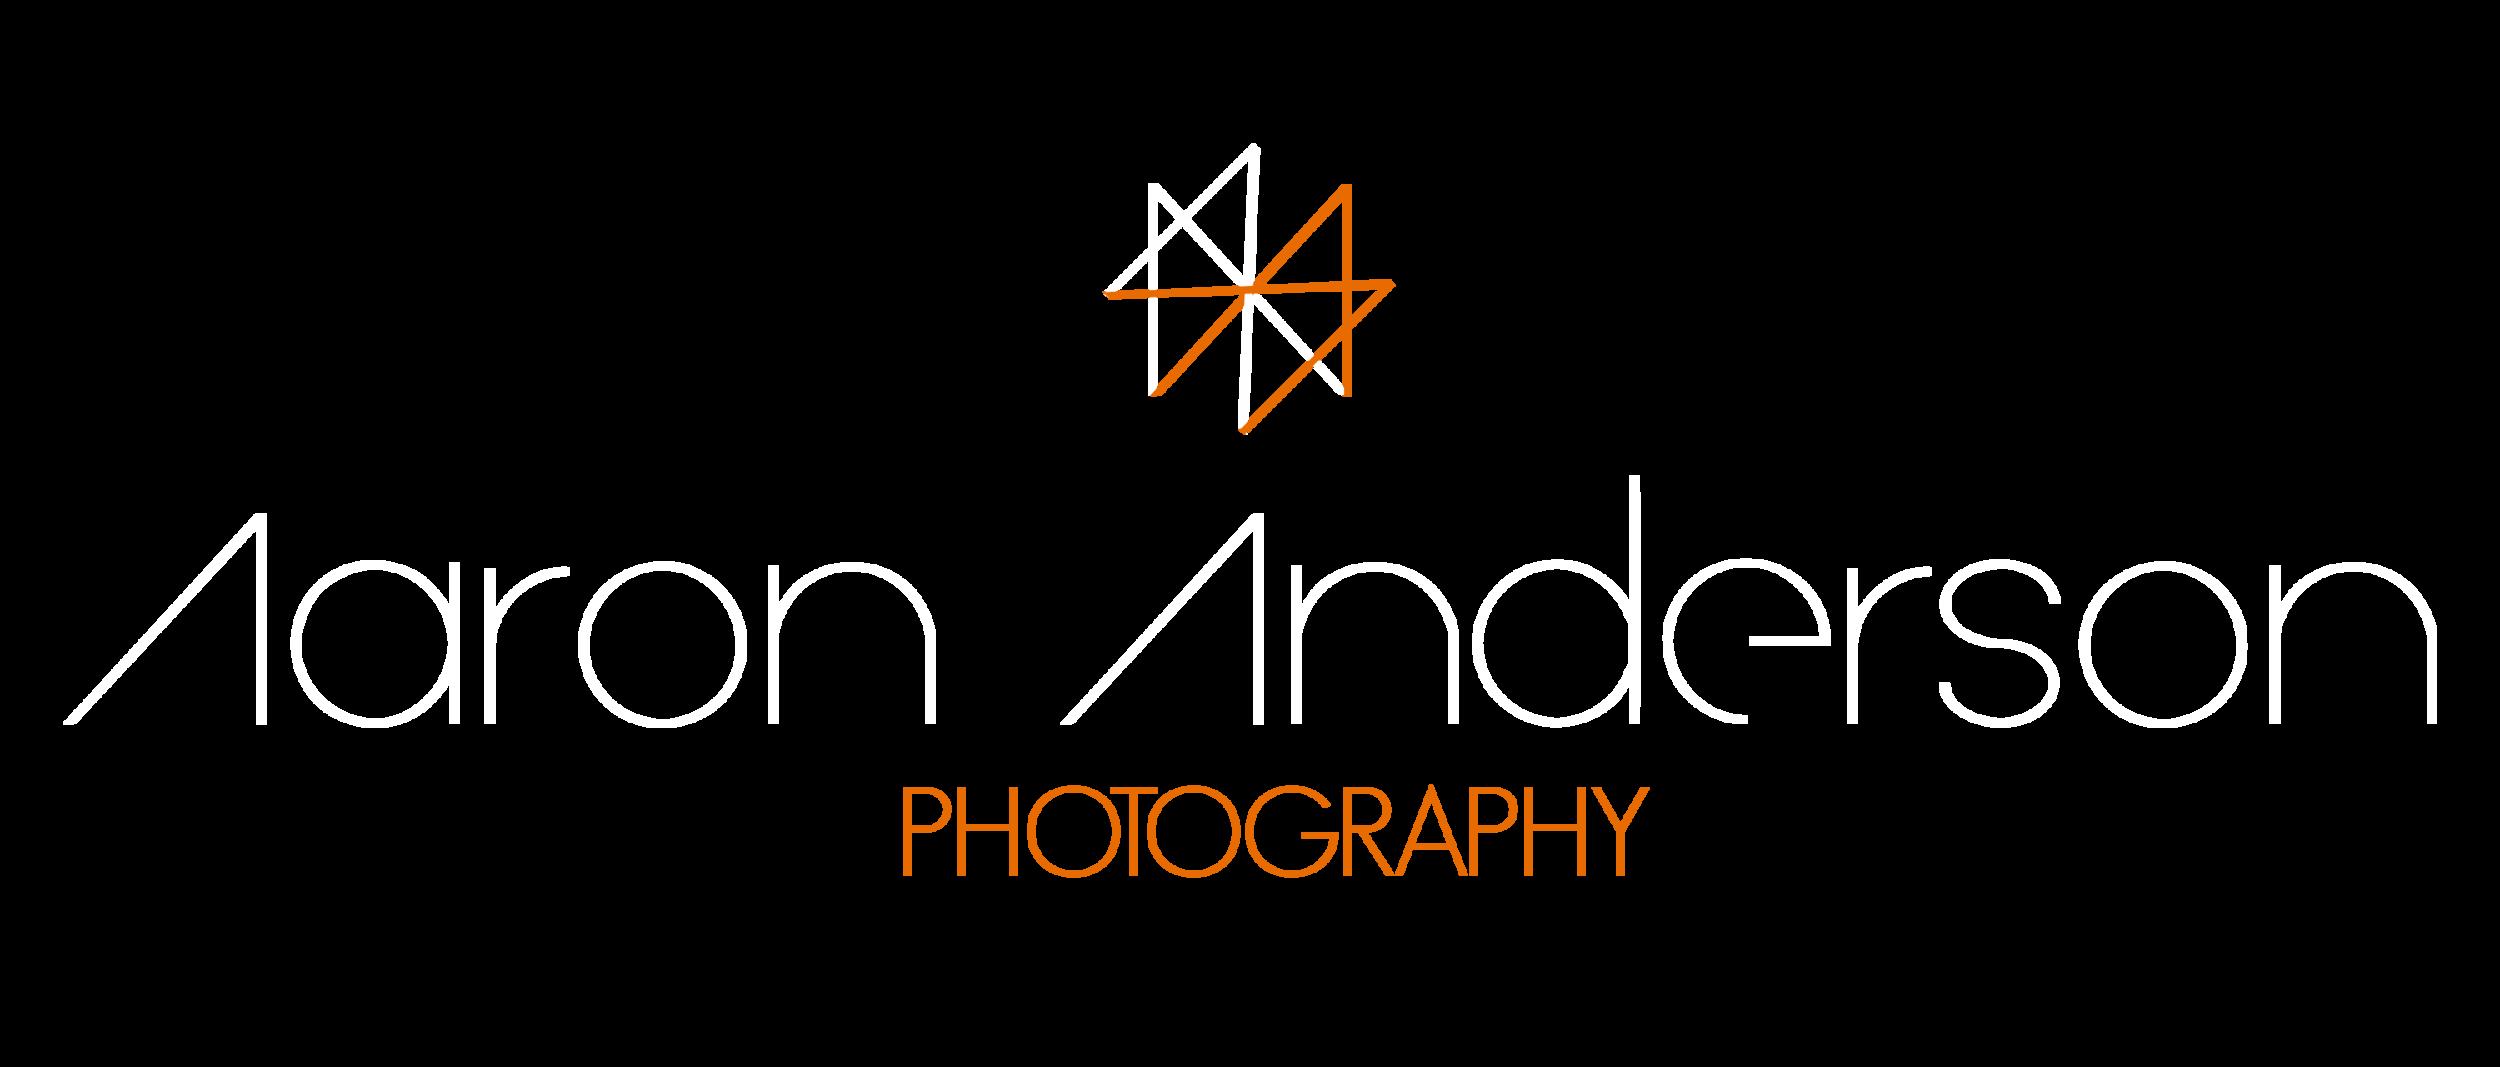 Aaron Anderson Photography Logo